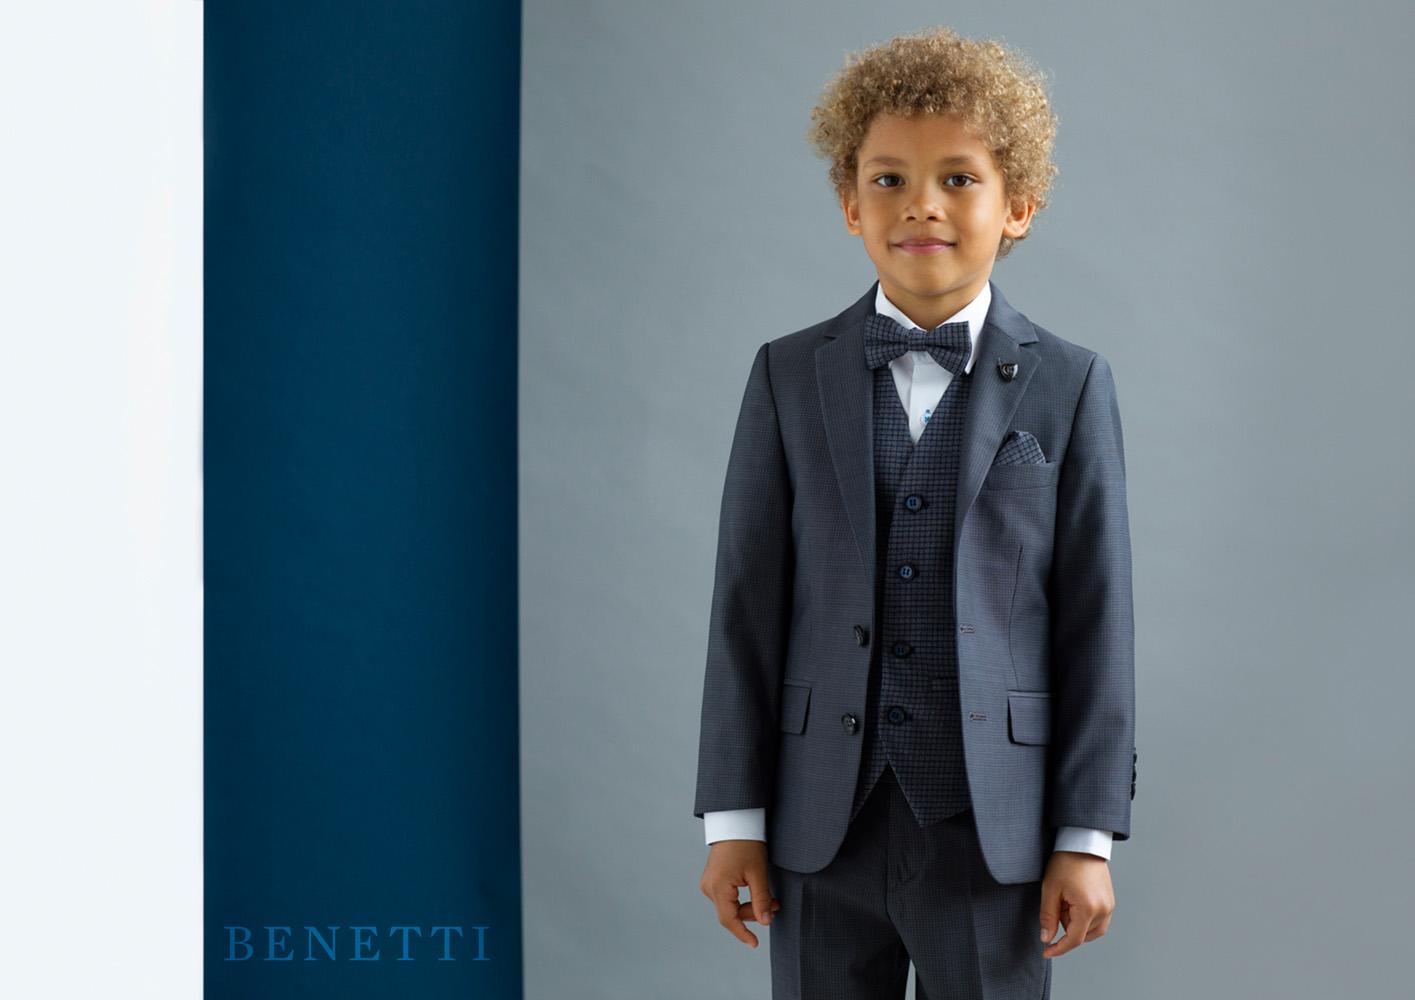 James Grey Tweed Boys 3 Piece Suit - Tom Murphy\'s Formal and Menswear